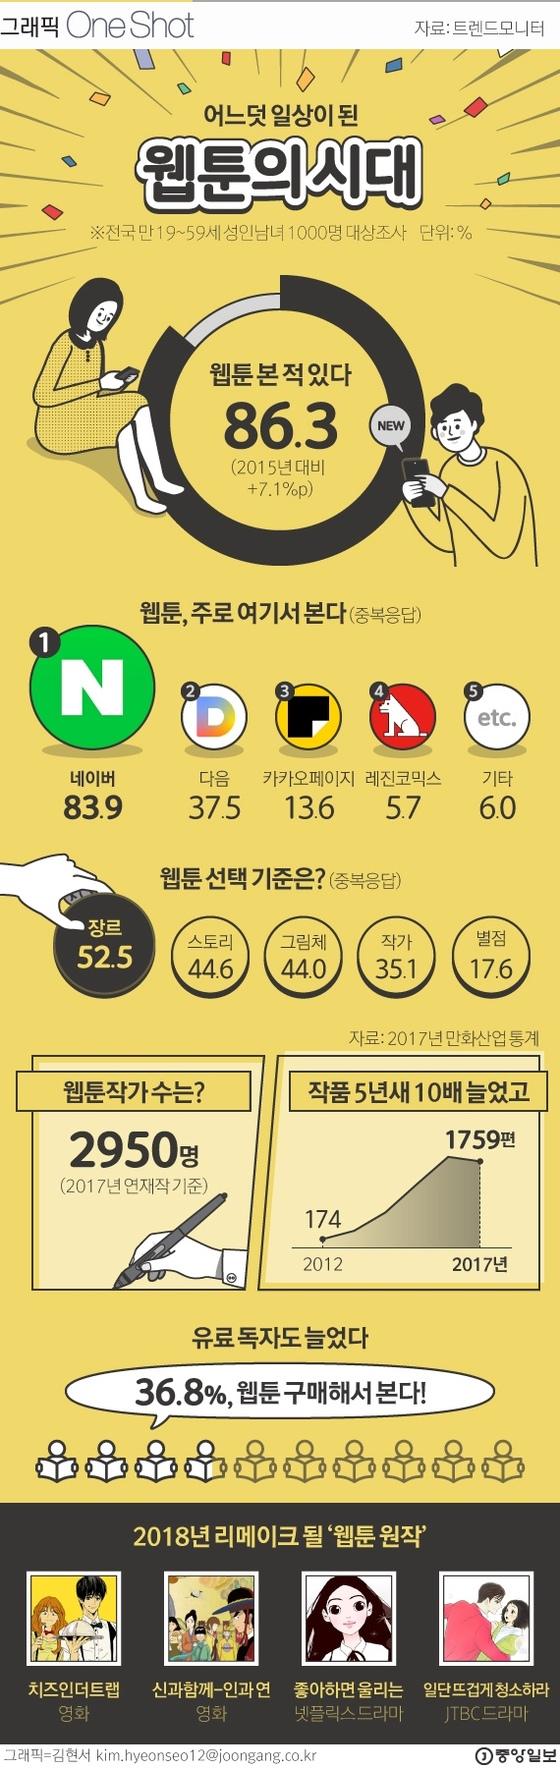 "[ONE SHOT] 웹툰 전성시대…10명 중 4명, ""유료여도 봐요"""